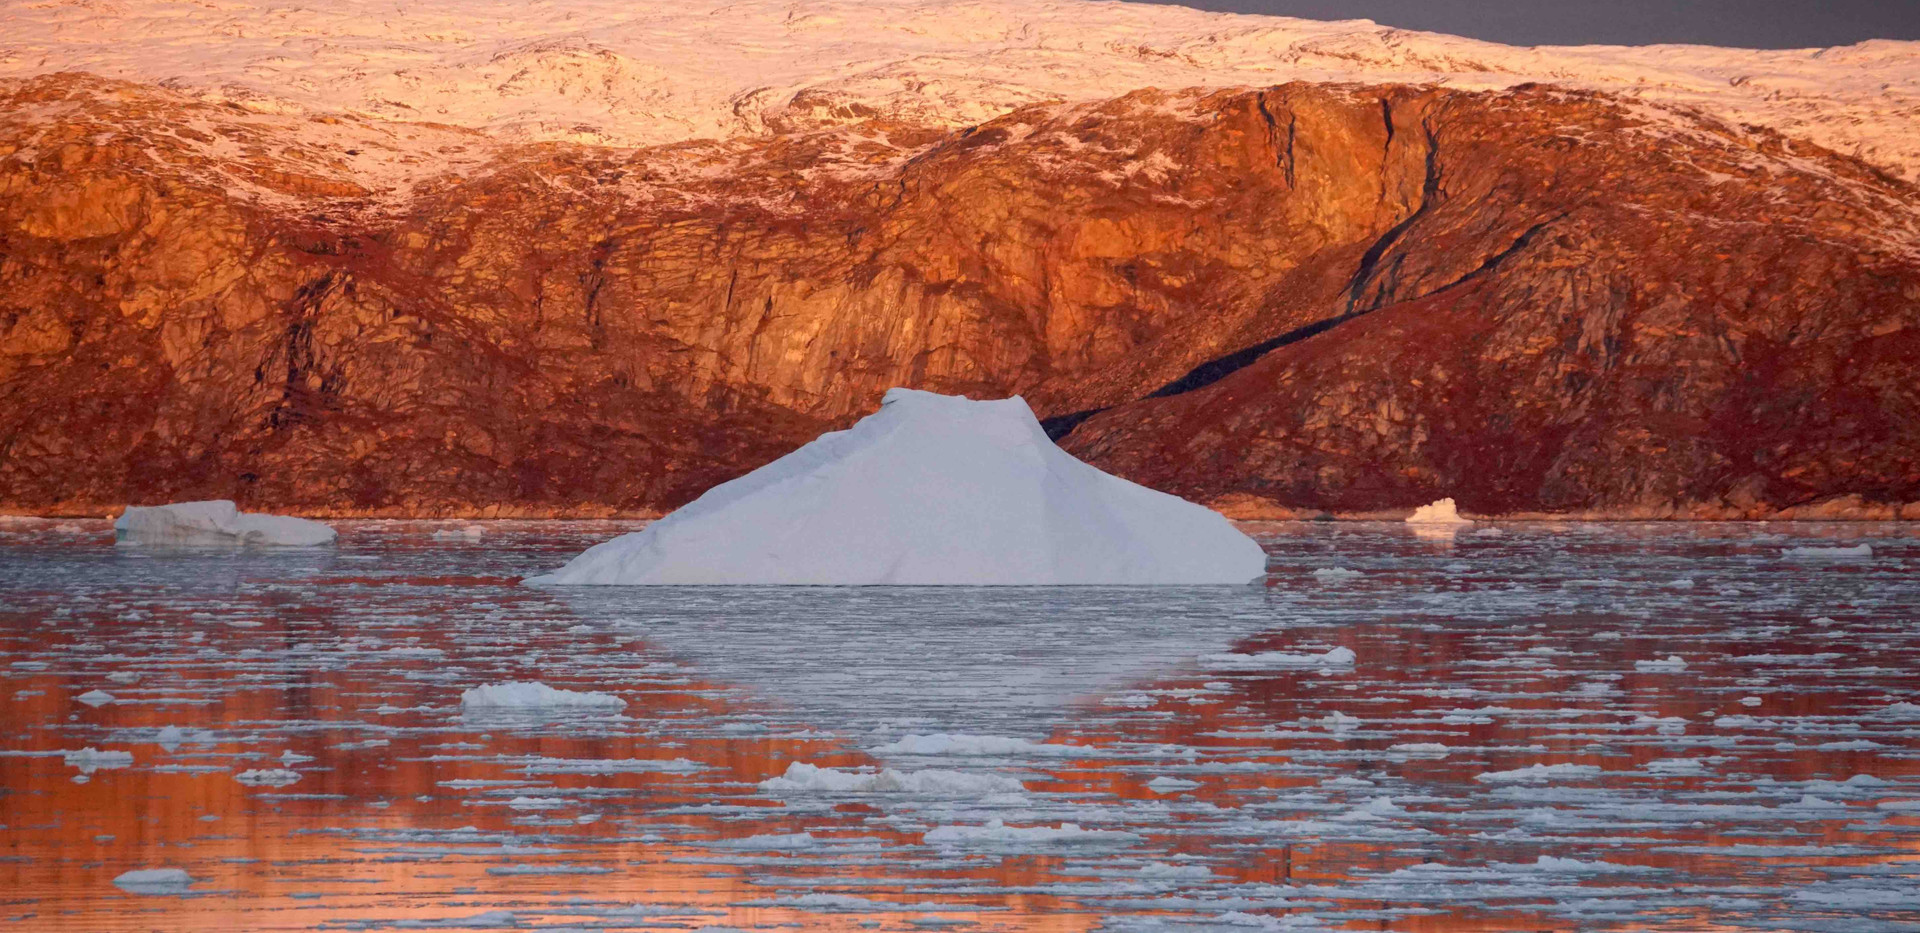 Ursula morning iceberg.jpg